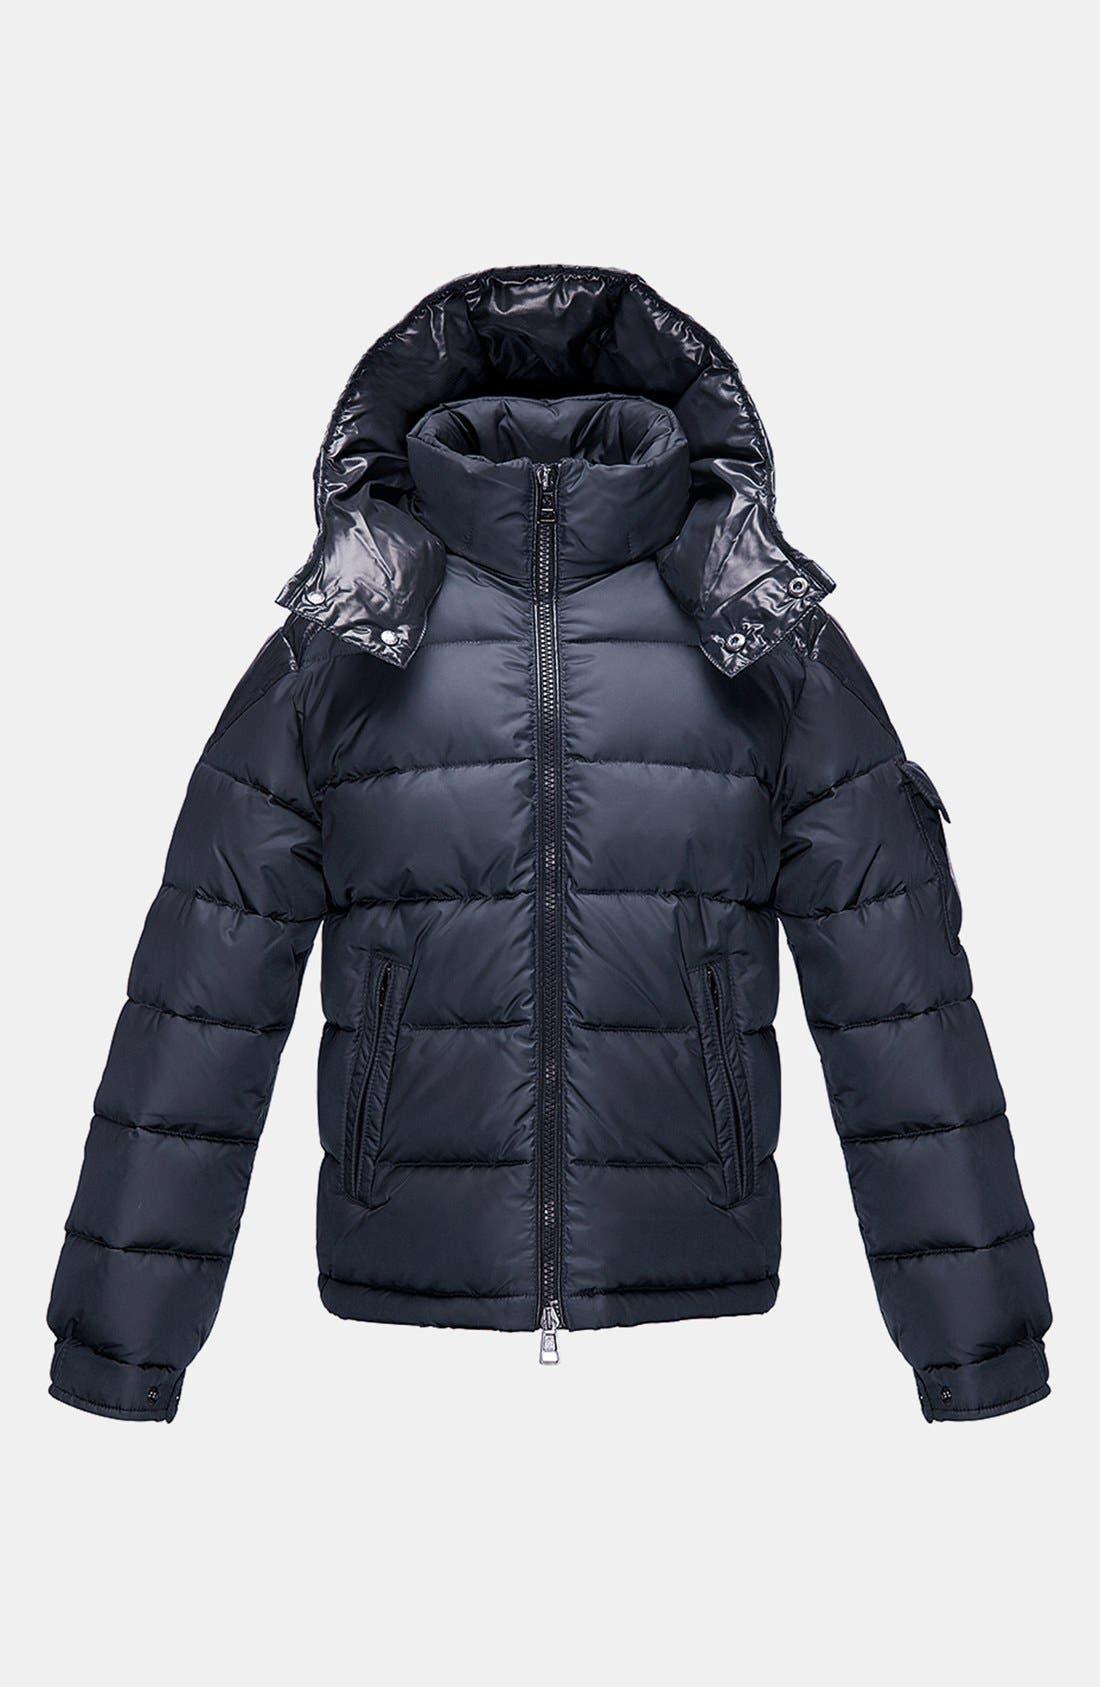 Main Image - Moncler 'Chevalier' Hooded Down Jacket (Toddler Boys, Little Boys & Big Boys)